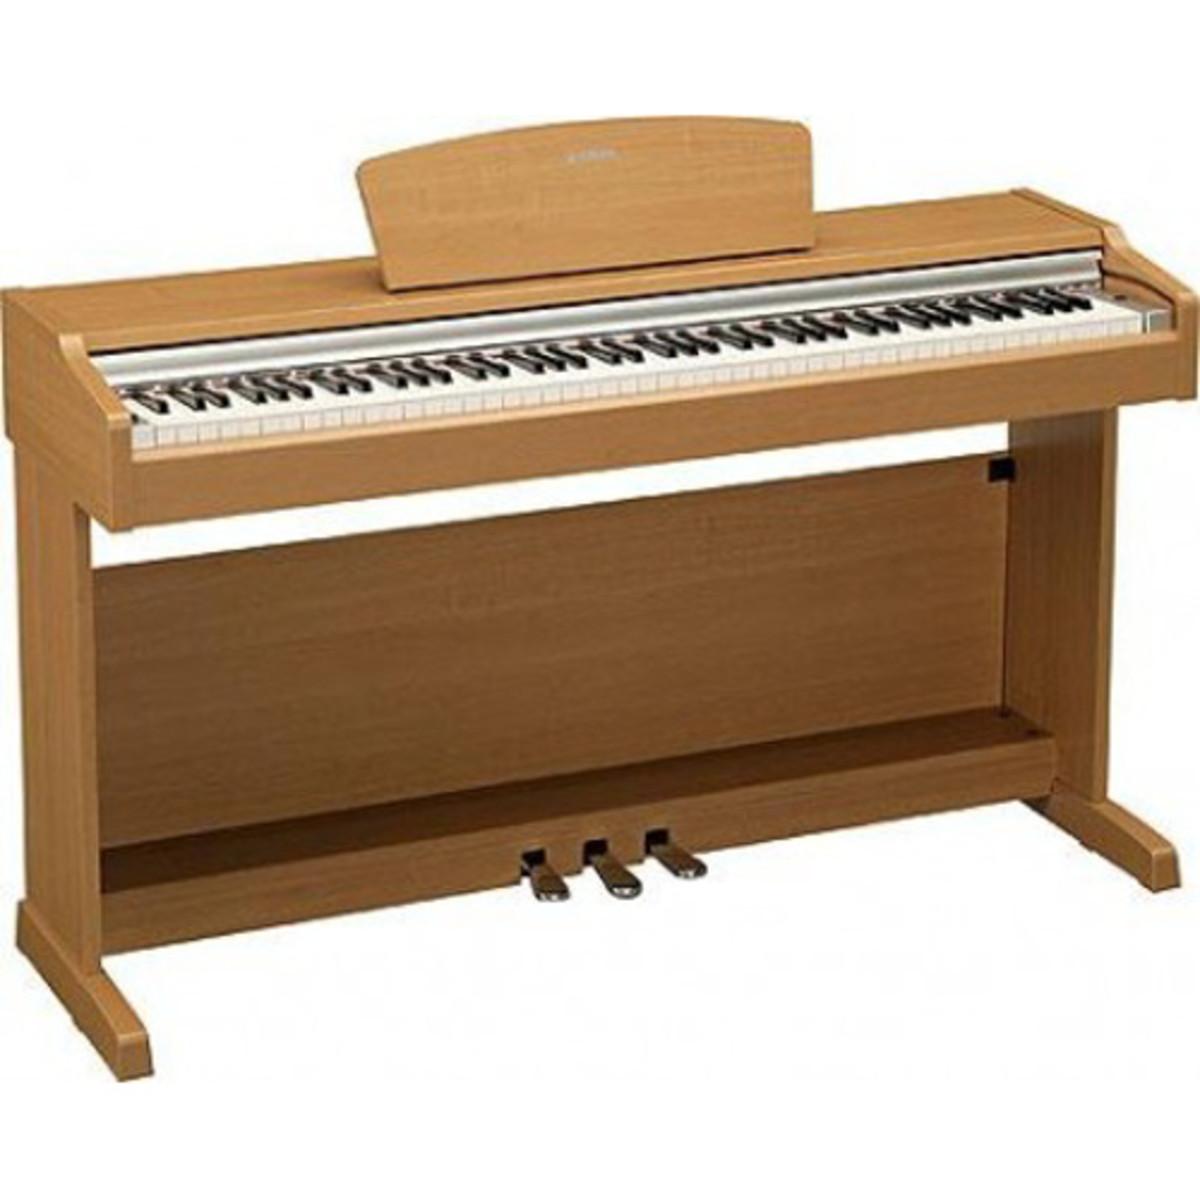 Disc yamaha ydp131c digital piano cherry at for Yamaha dgx640c digital piano cherry